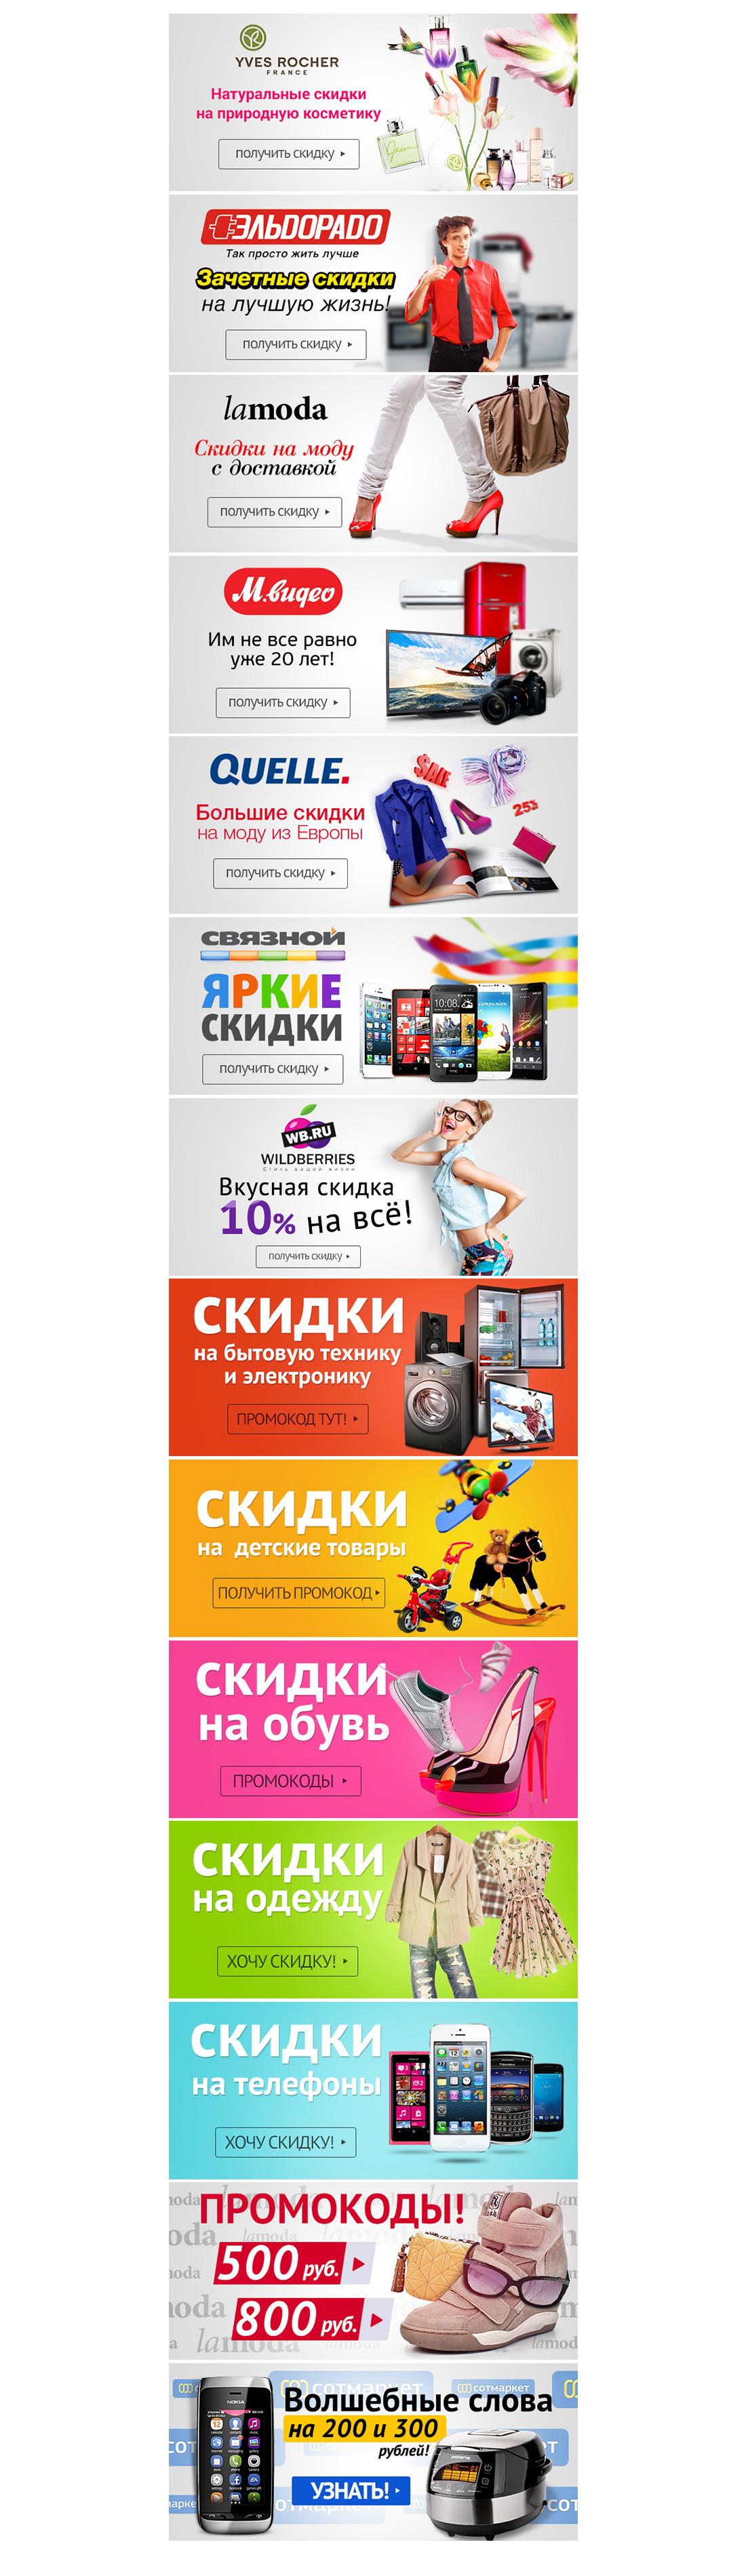 VipKodik.ru / Скидочный сервис /